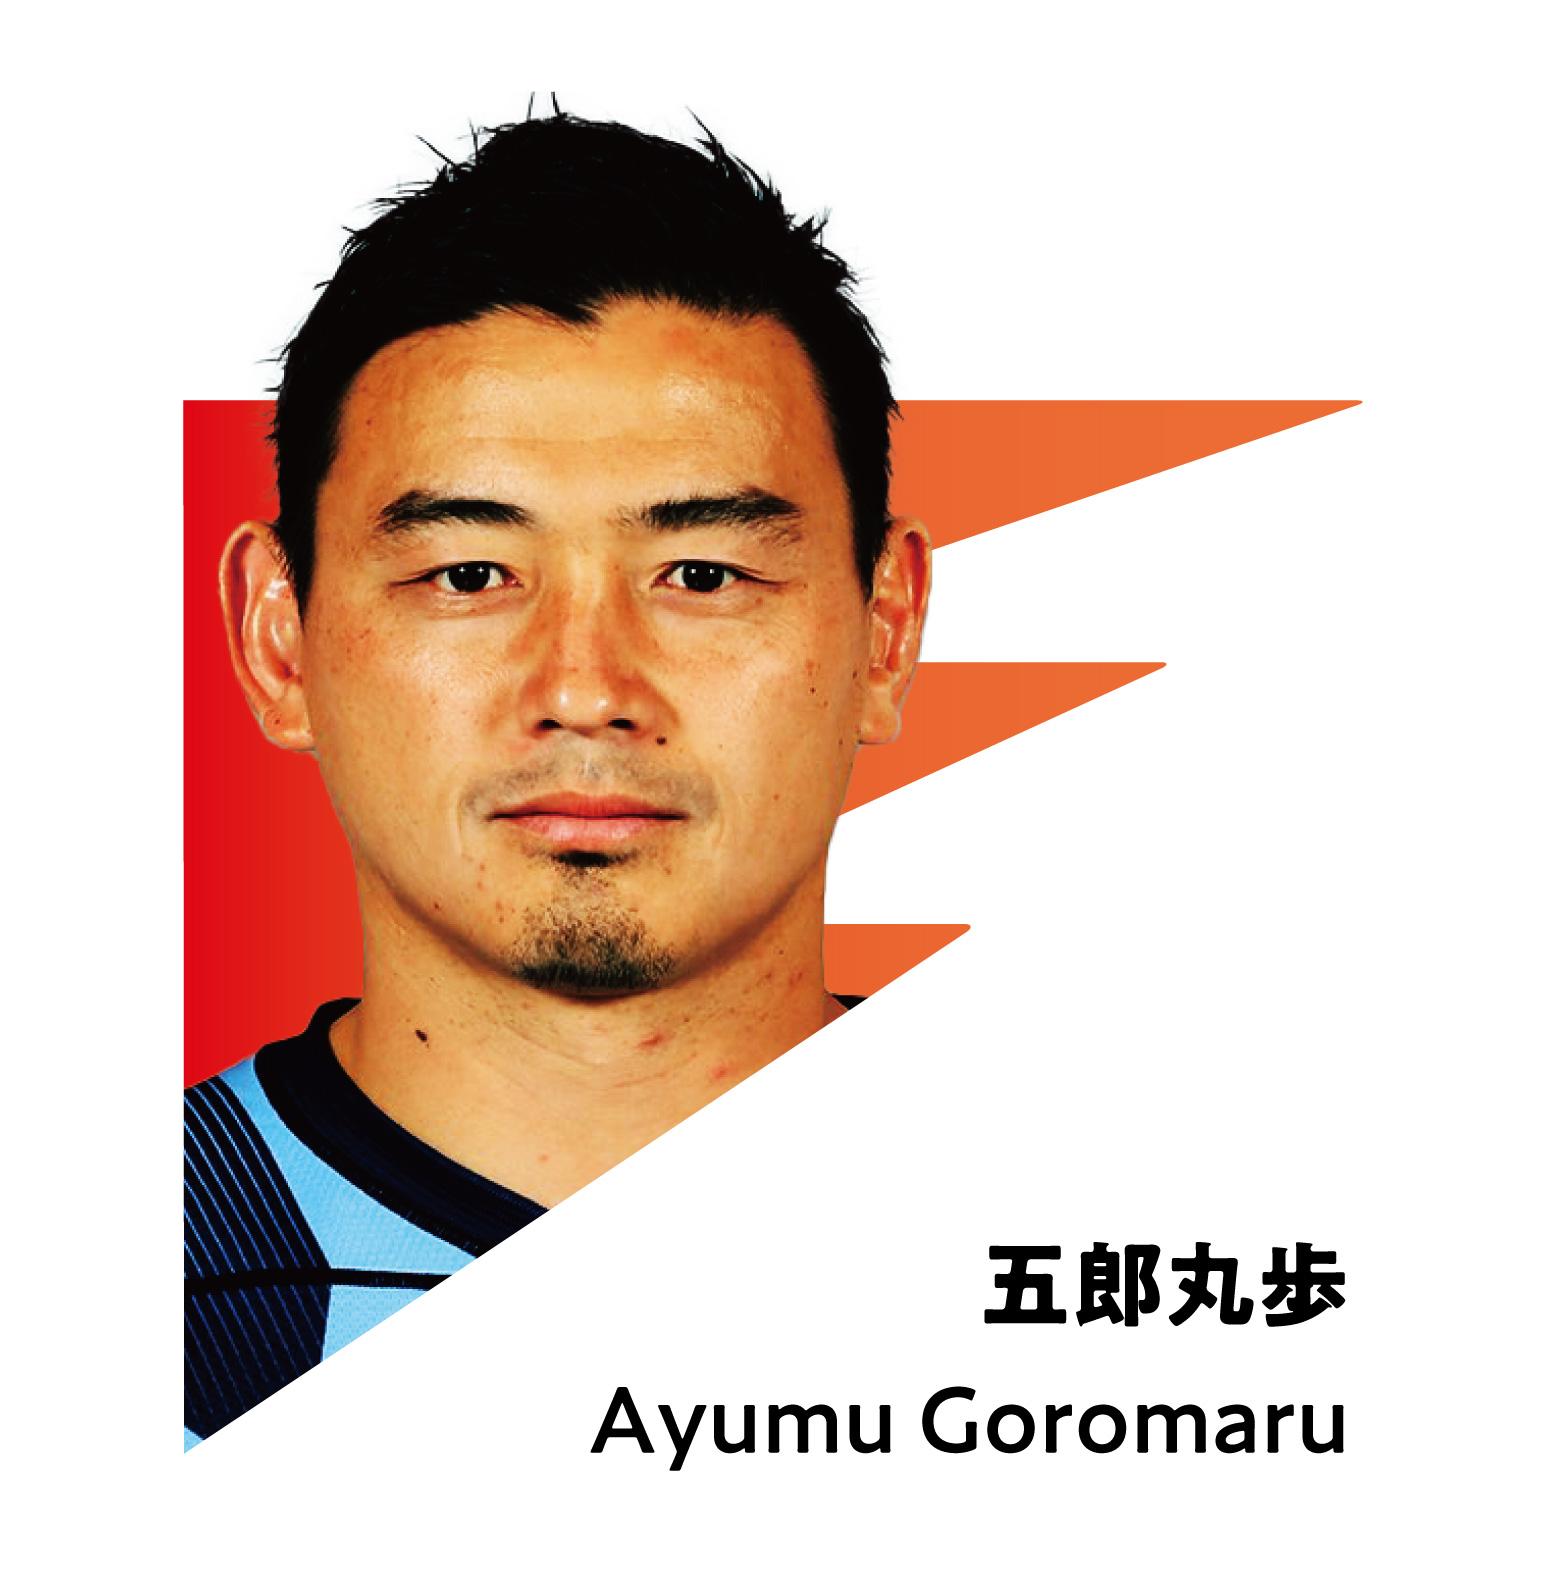 AYUMU GOROMARU